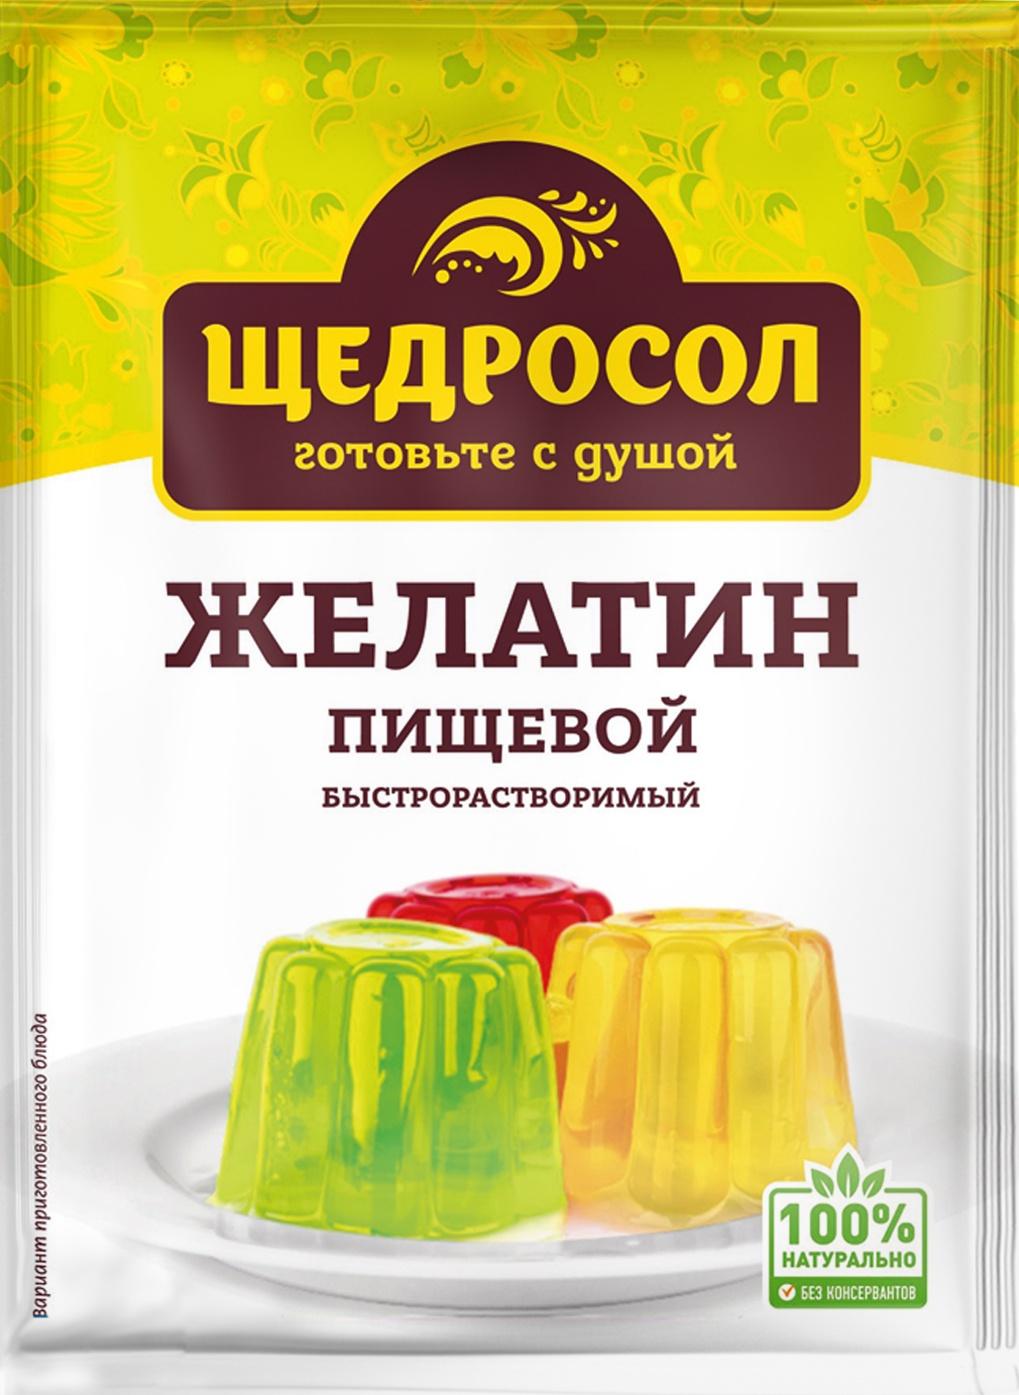 Желатин пищевой 40г, Щедросол для волос желатин